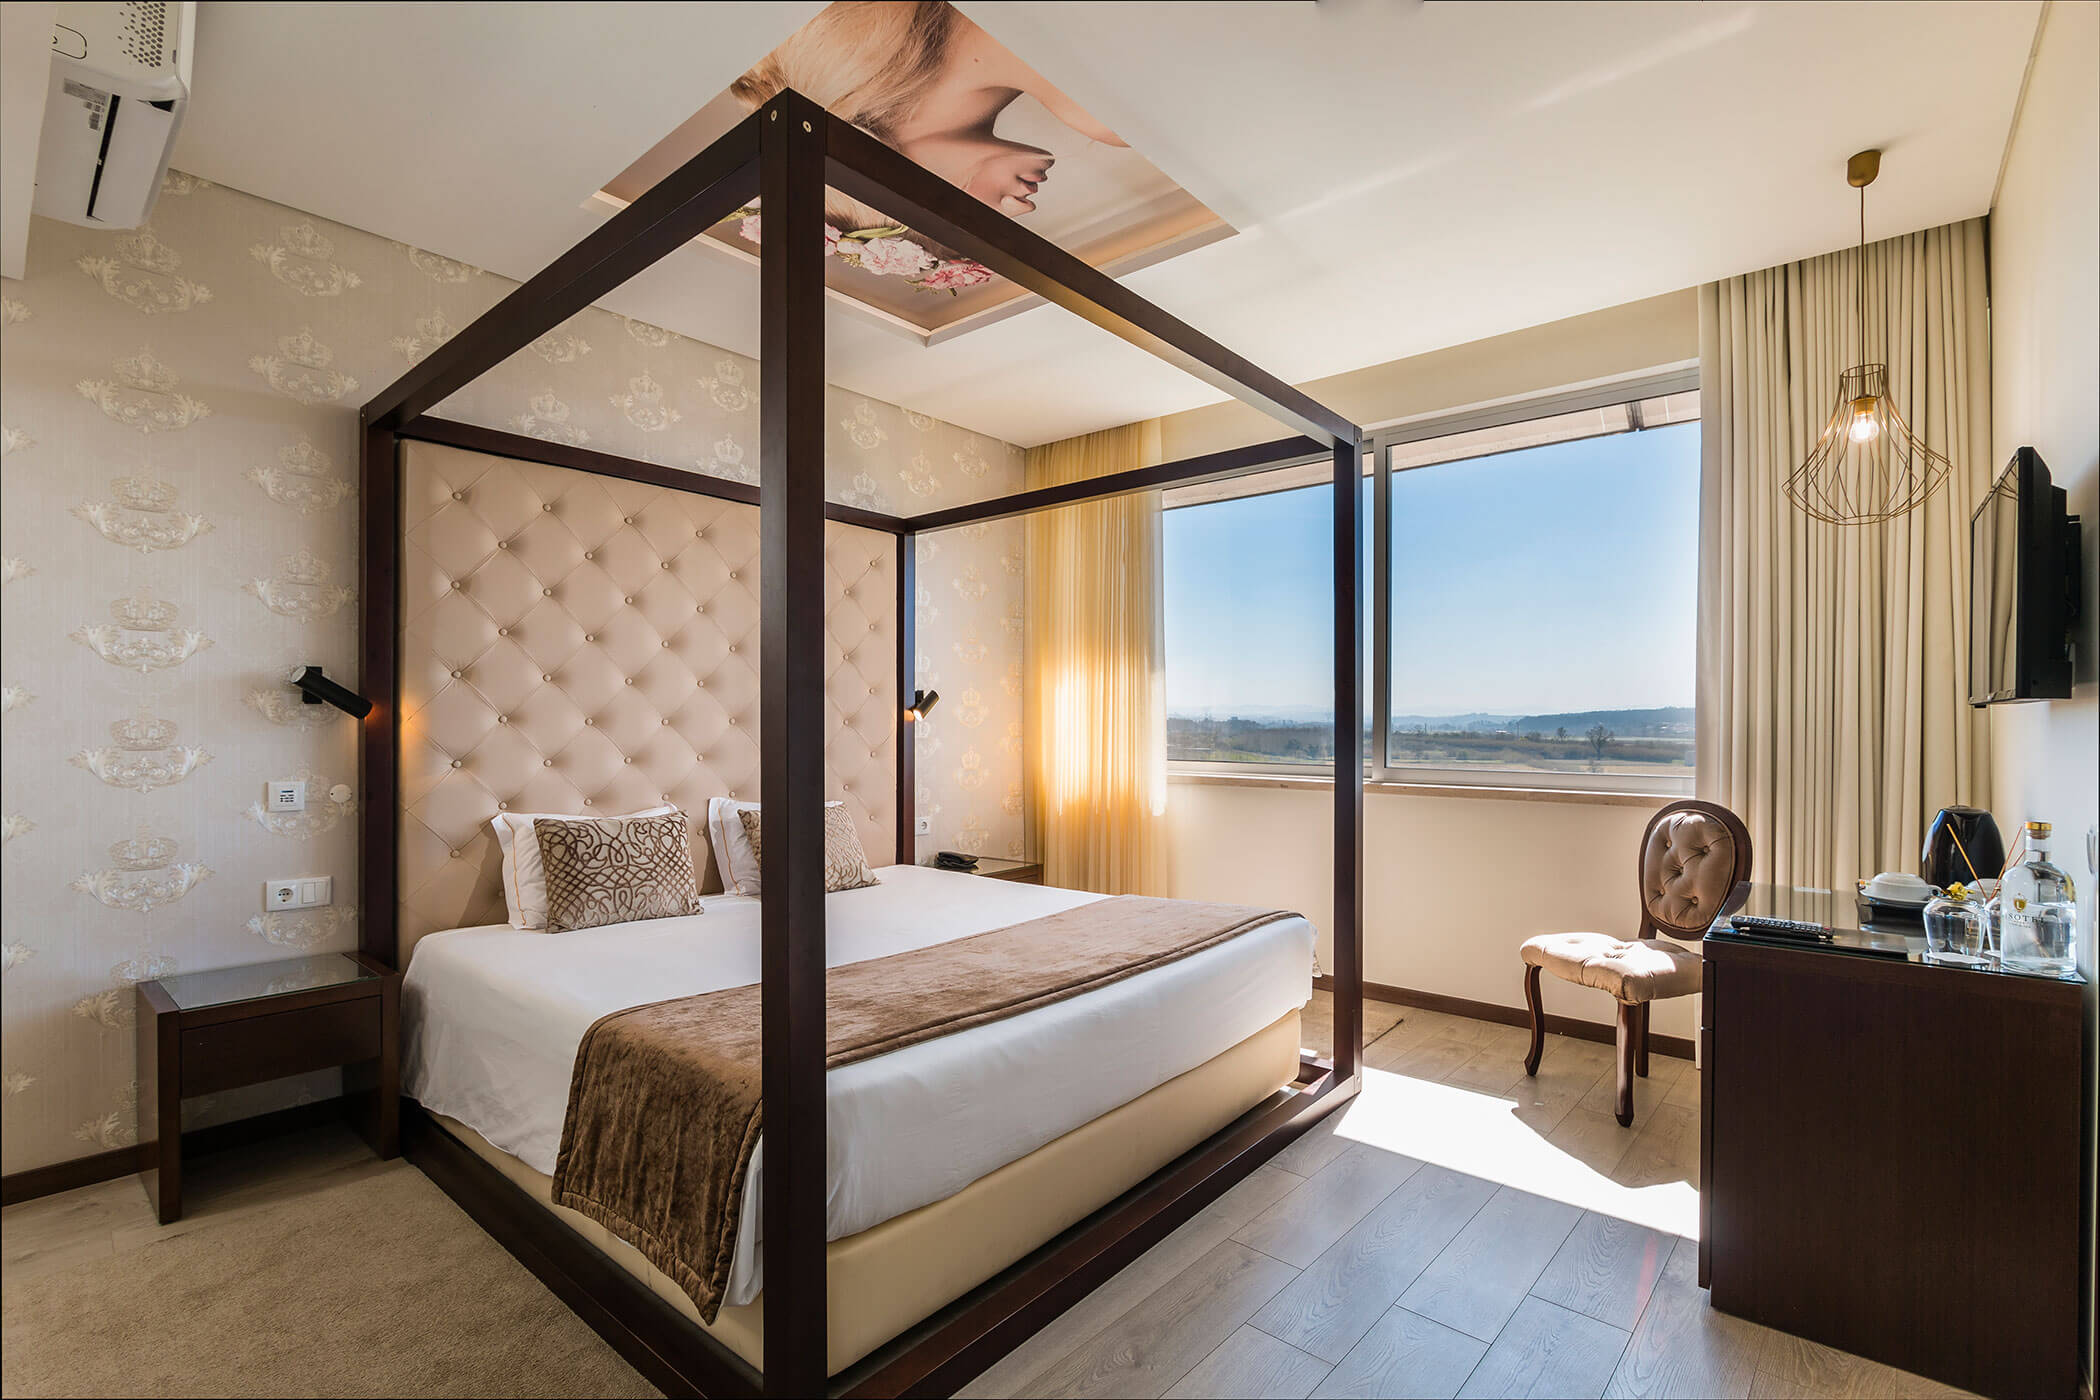 Quarto Duplo Superior Princesa Zara - Lisotel Hotel e Spa, Leiria